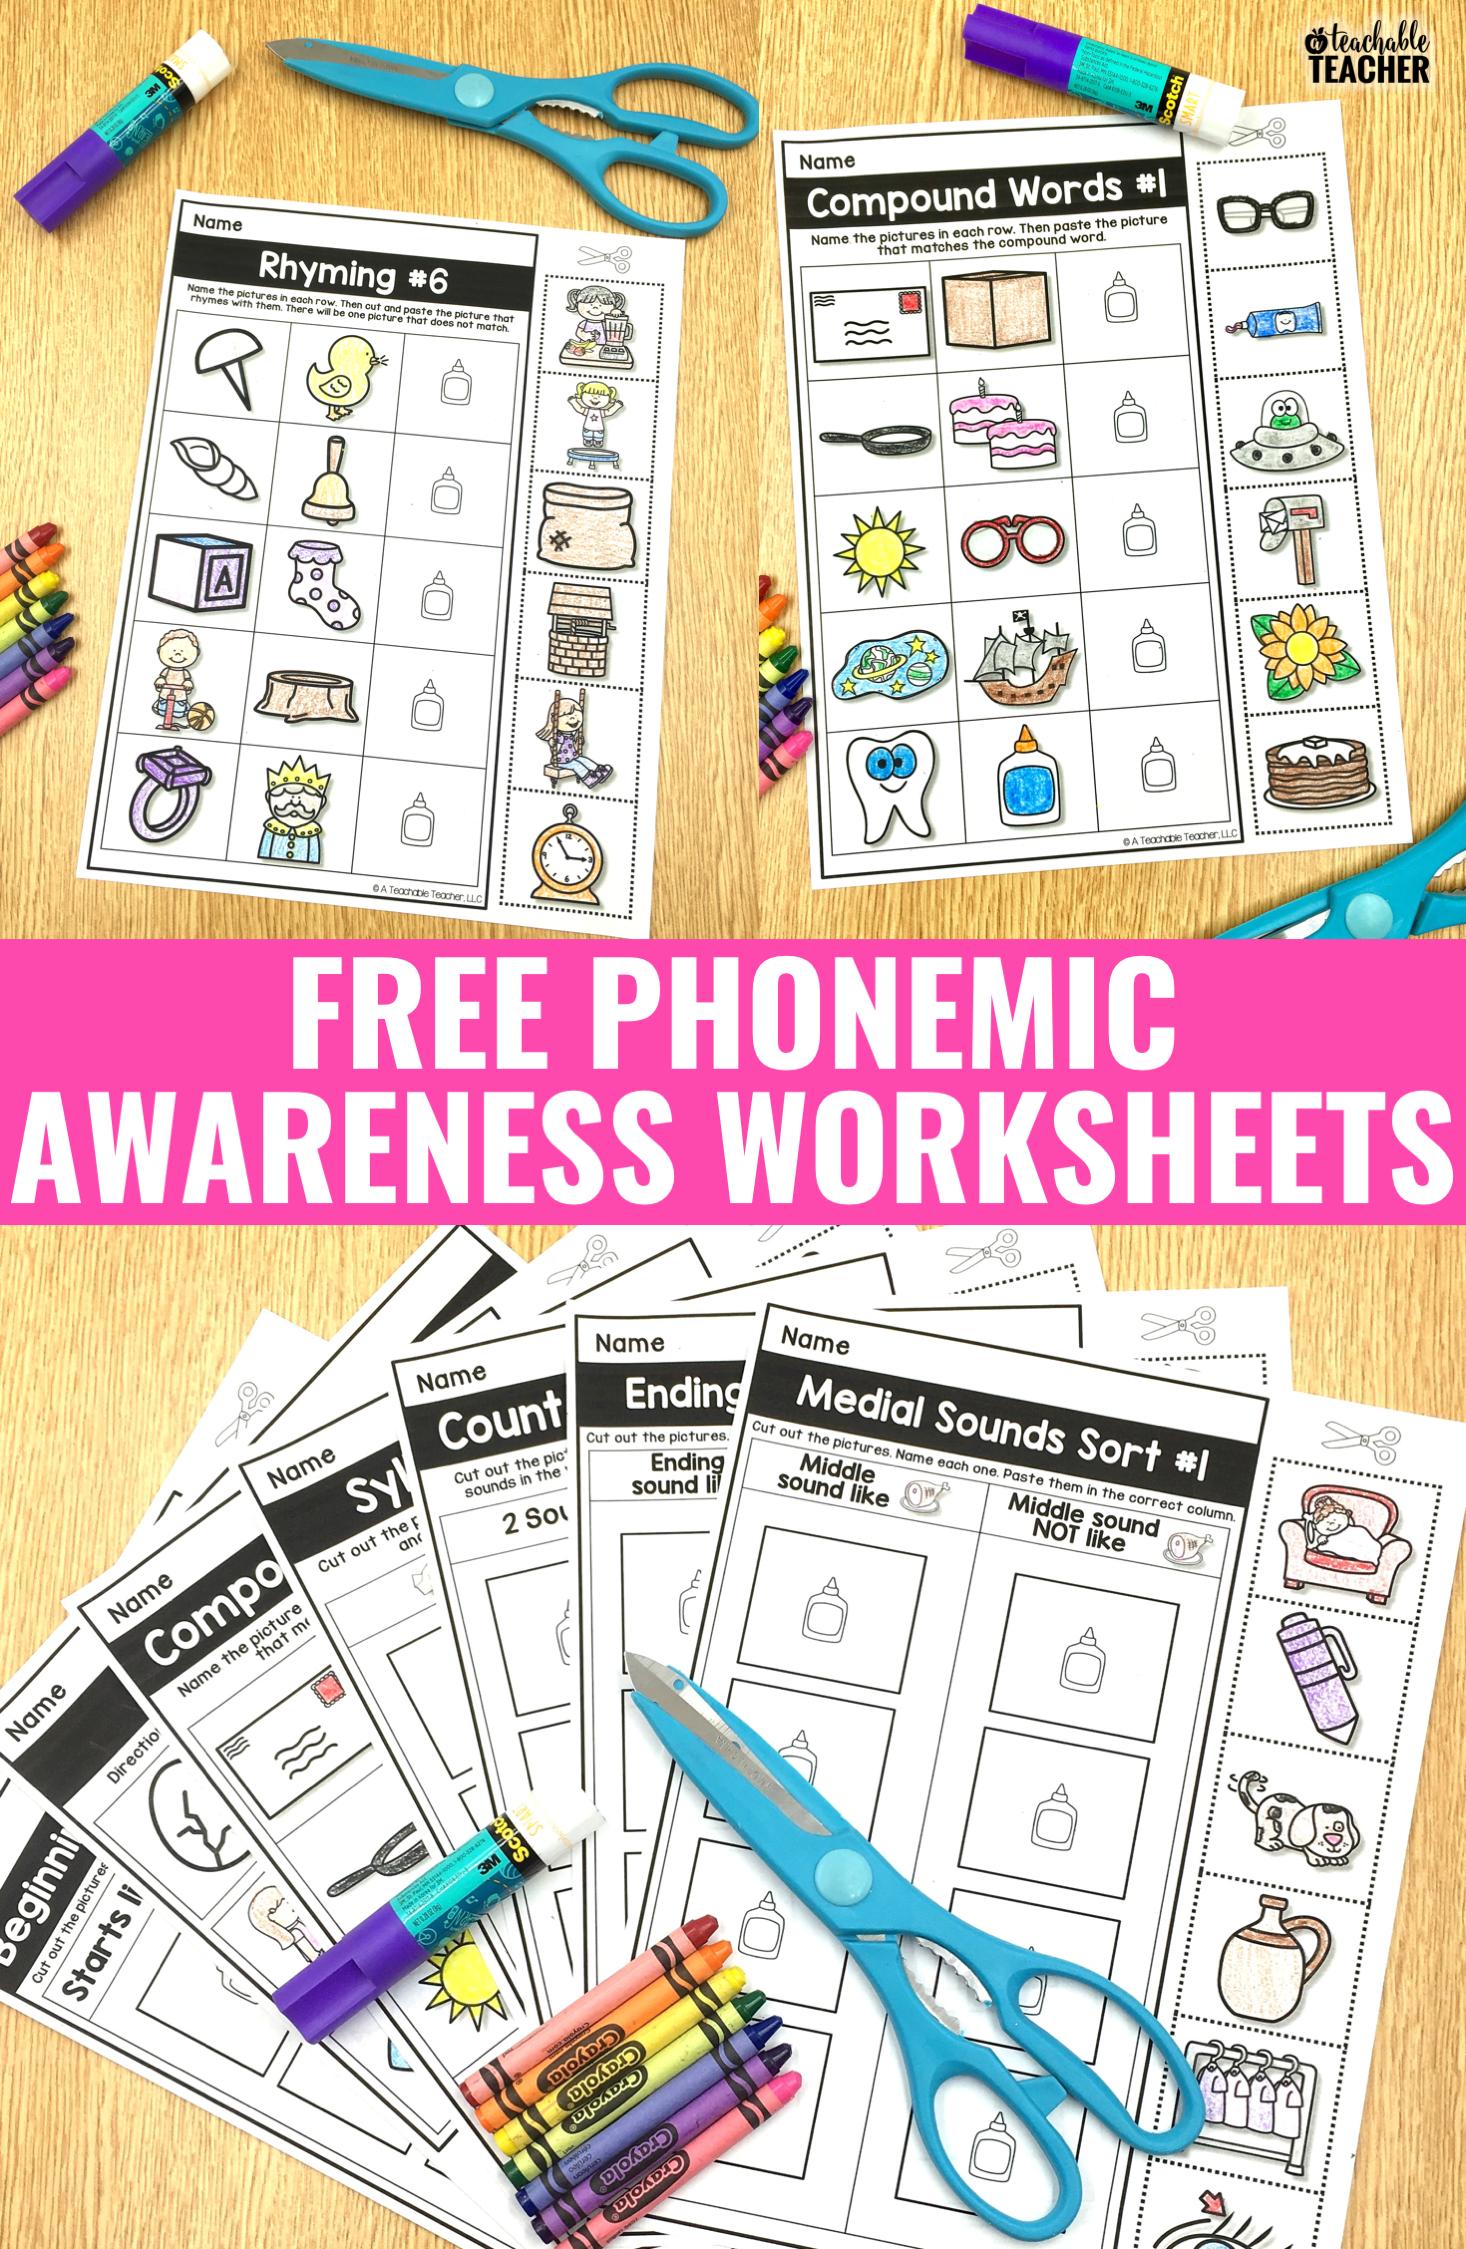 Free Phonemic Awareness Worksheets - Interactive And Picture-Based | Free Printable Phoneme Segmentation Worksheets